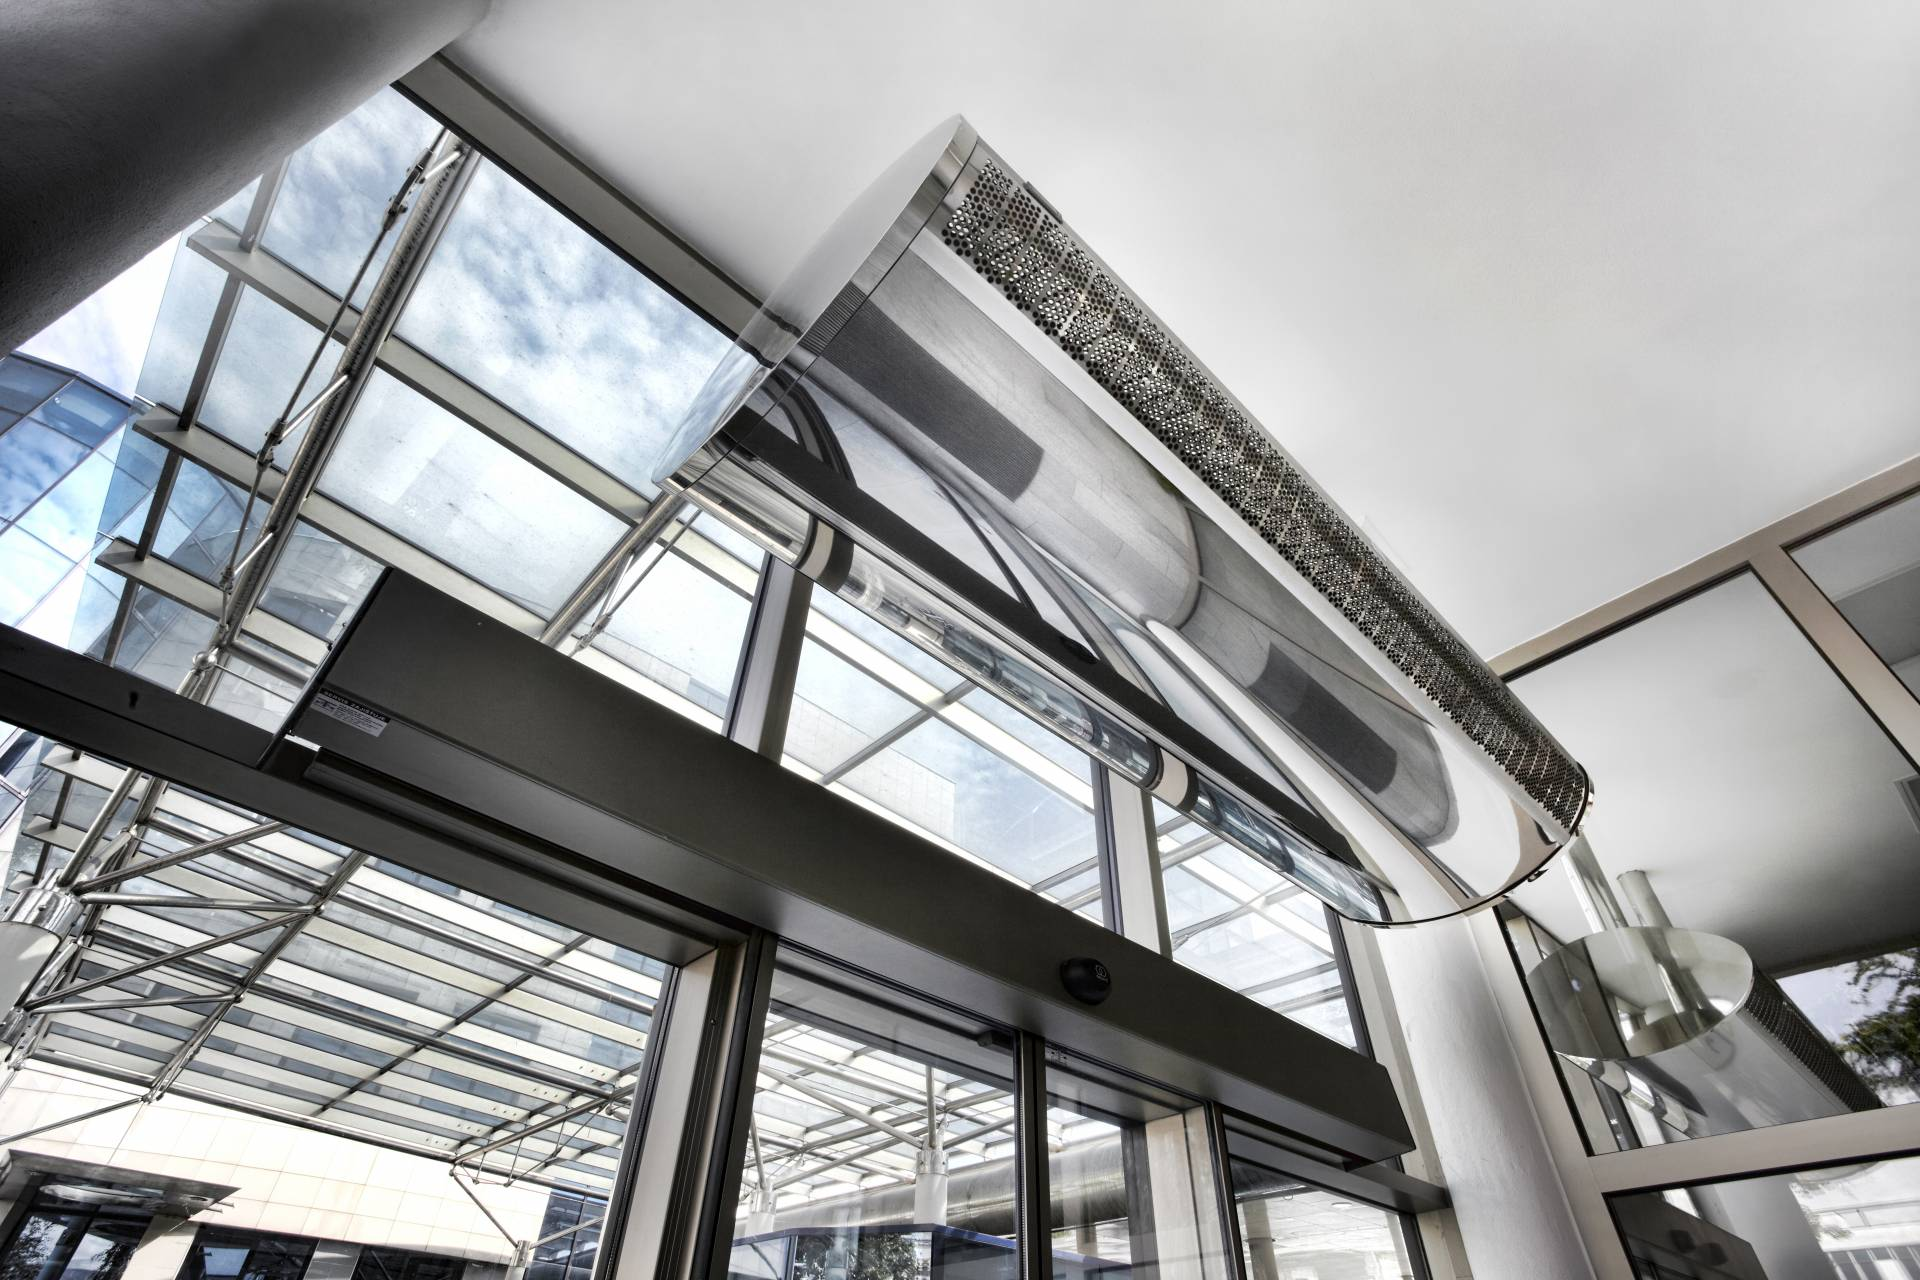 Perdele de aer - Design - Climatica SRL - Excelenta in Climatizare